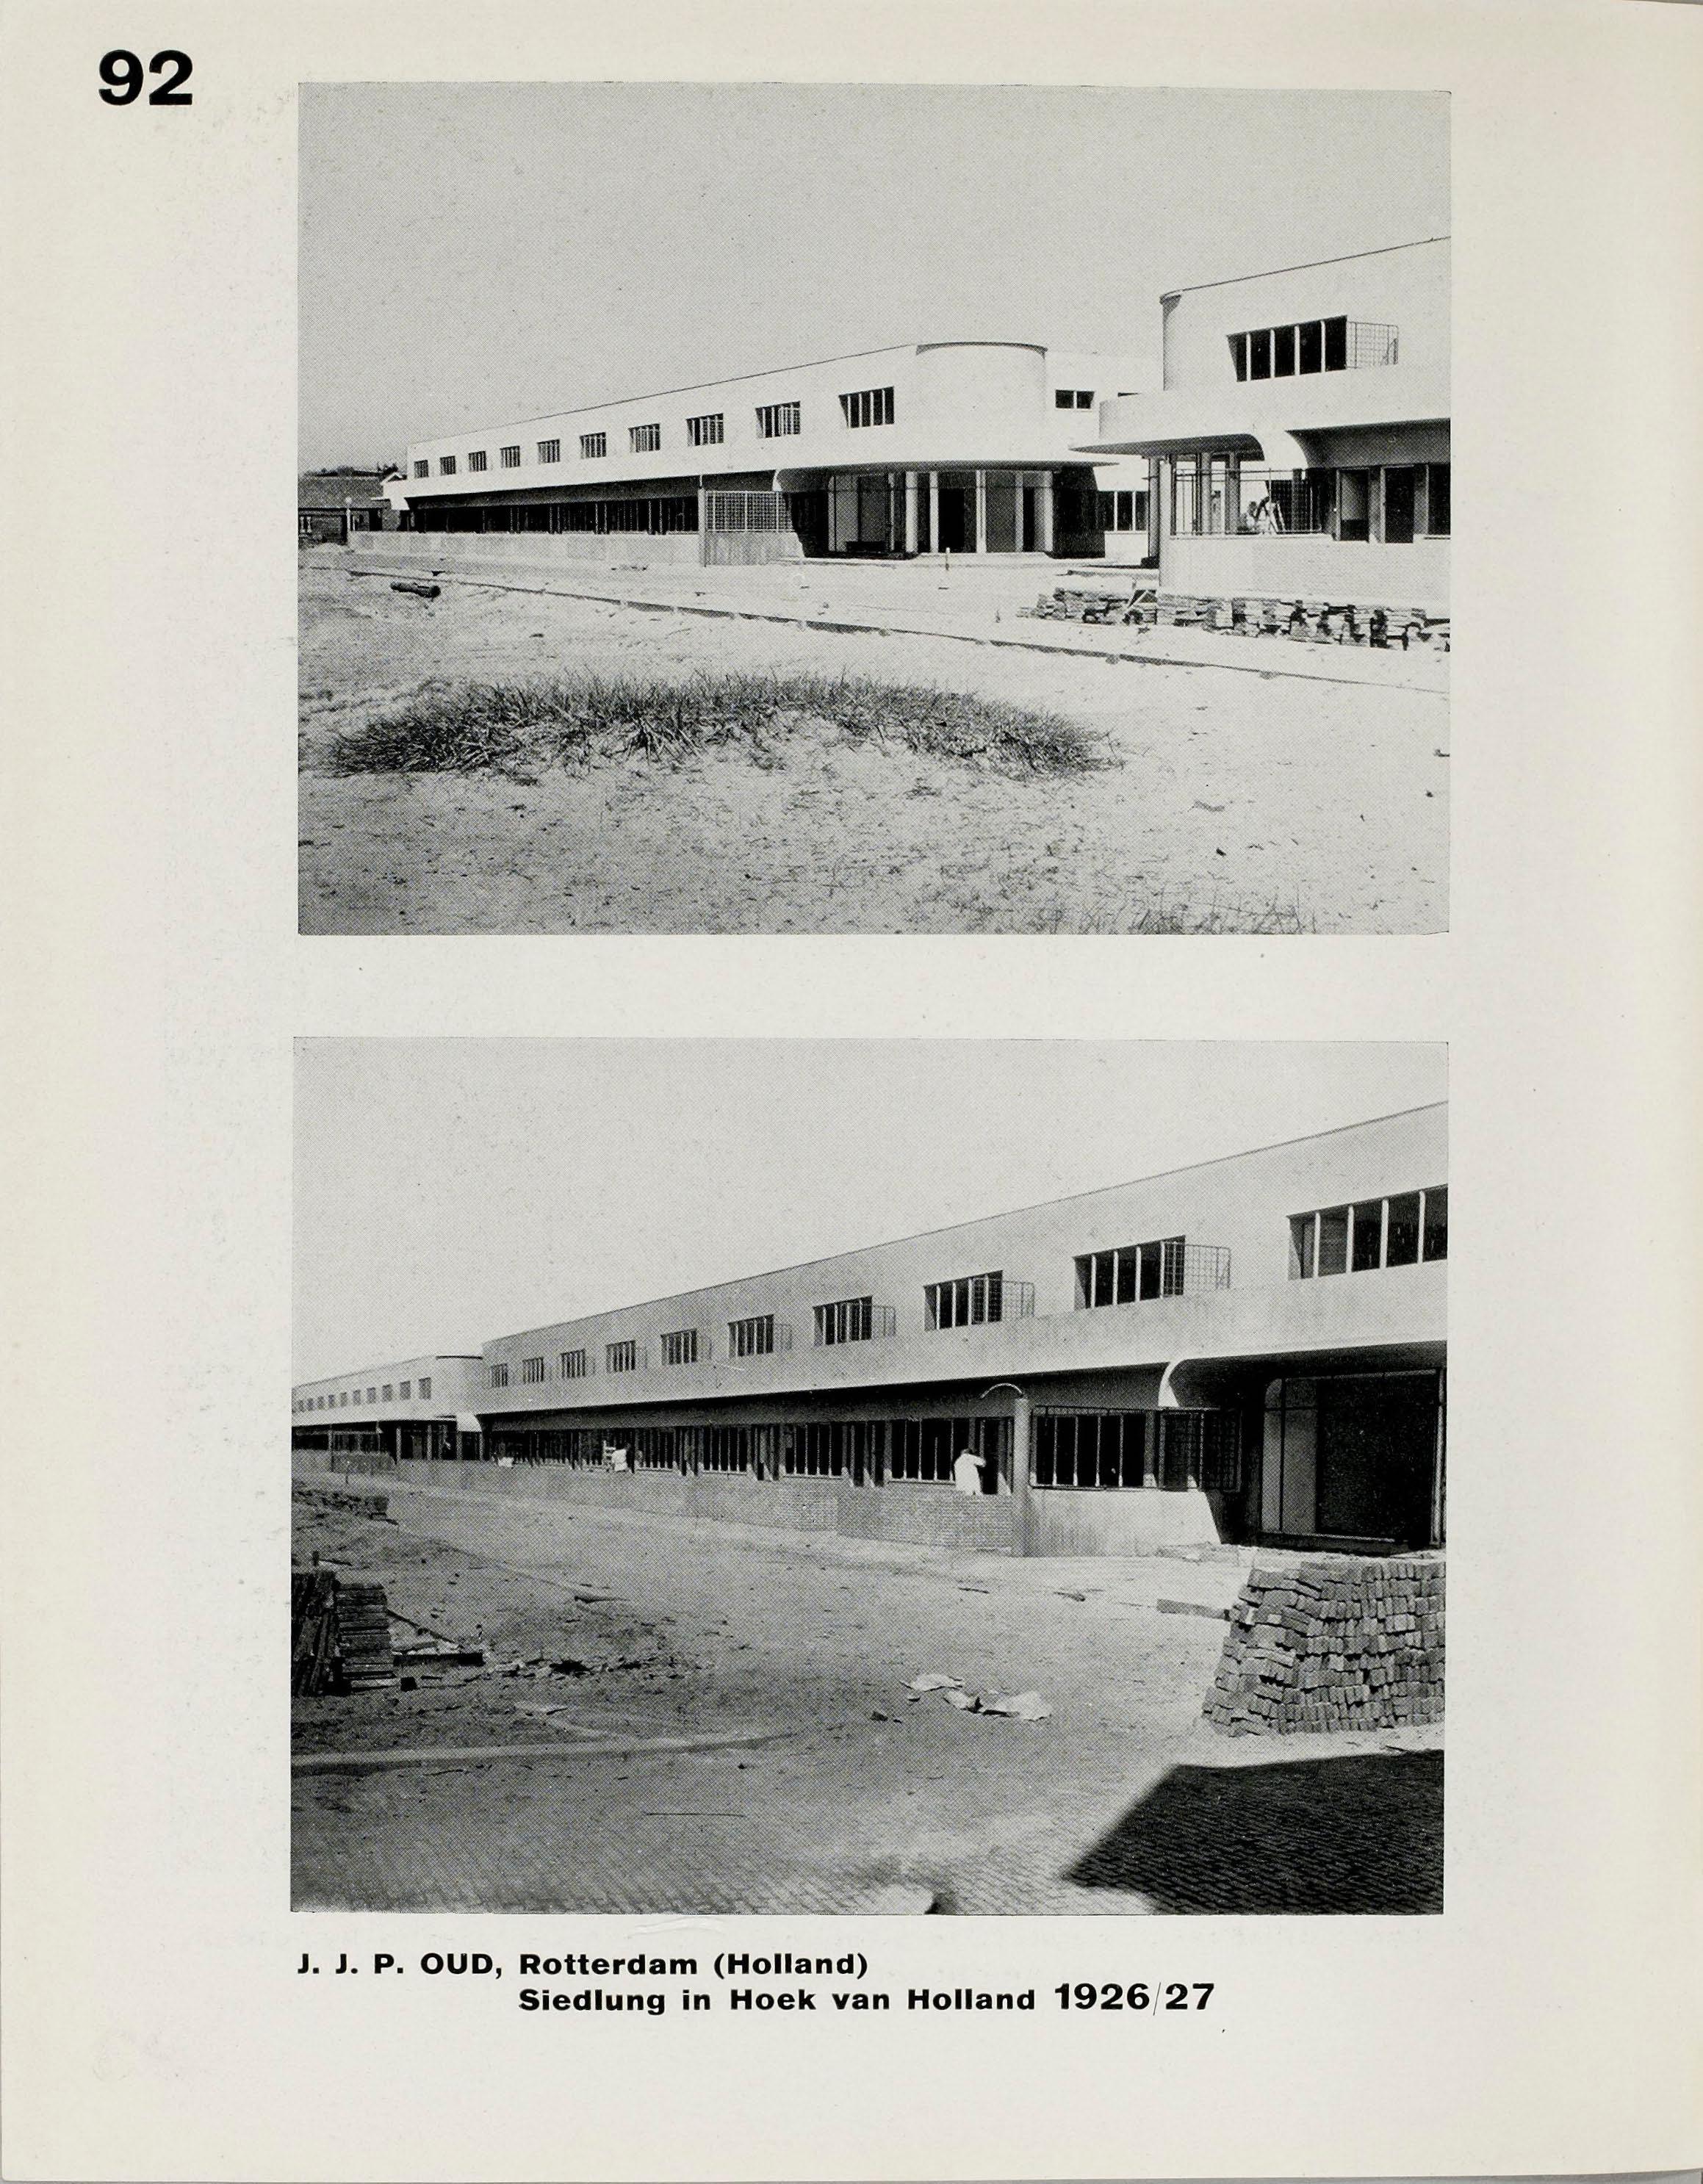 bauhausb cher 1 walter gropius ed internationale architektur 1925 111 p 23 cm page 094. Black Bedroom Furniture Sets. Home Design Ideas